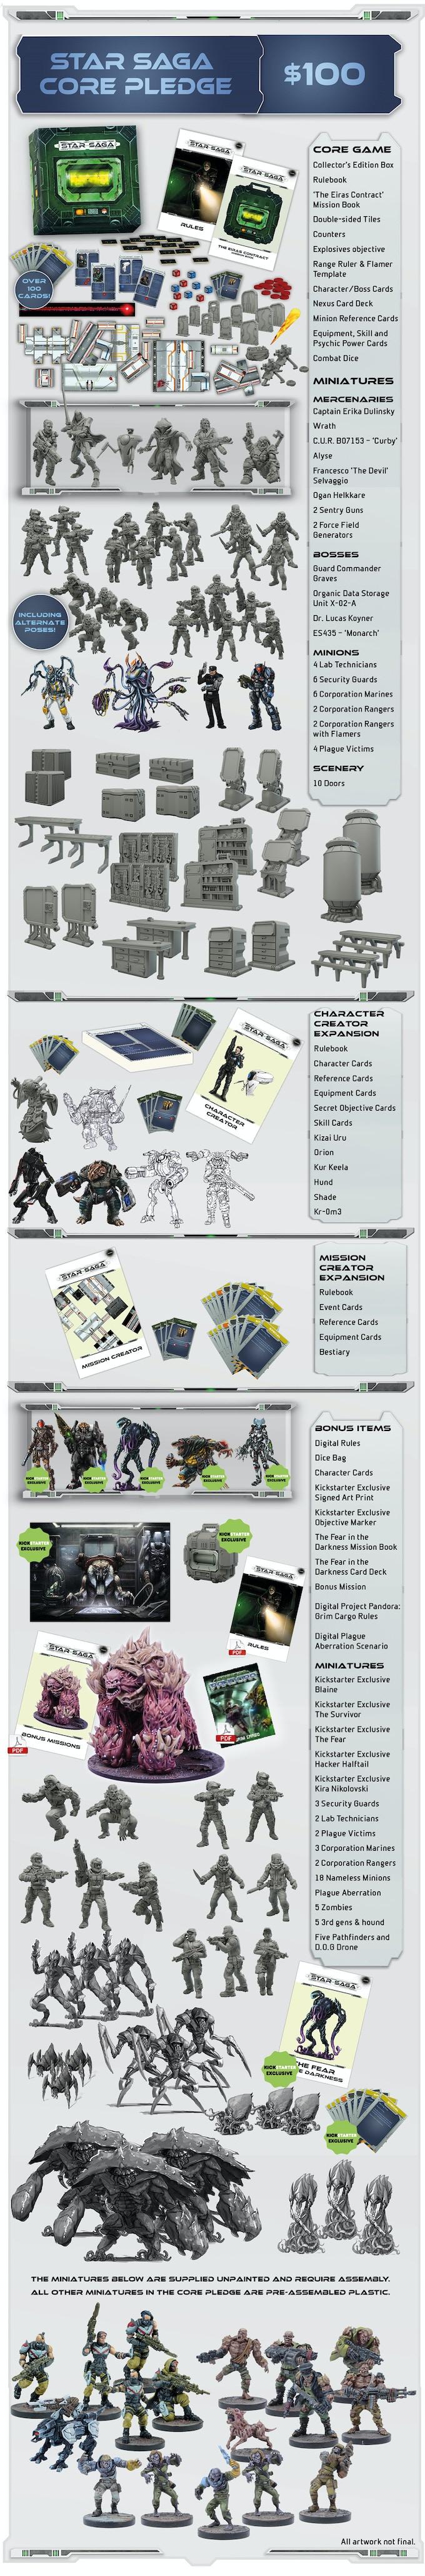 Star Saga - The Sci-fi Dungeon Crawler by Mantic Games